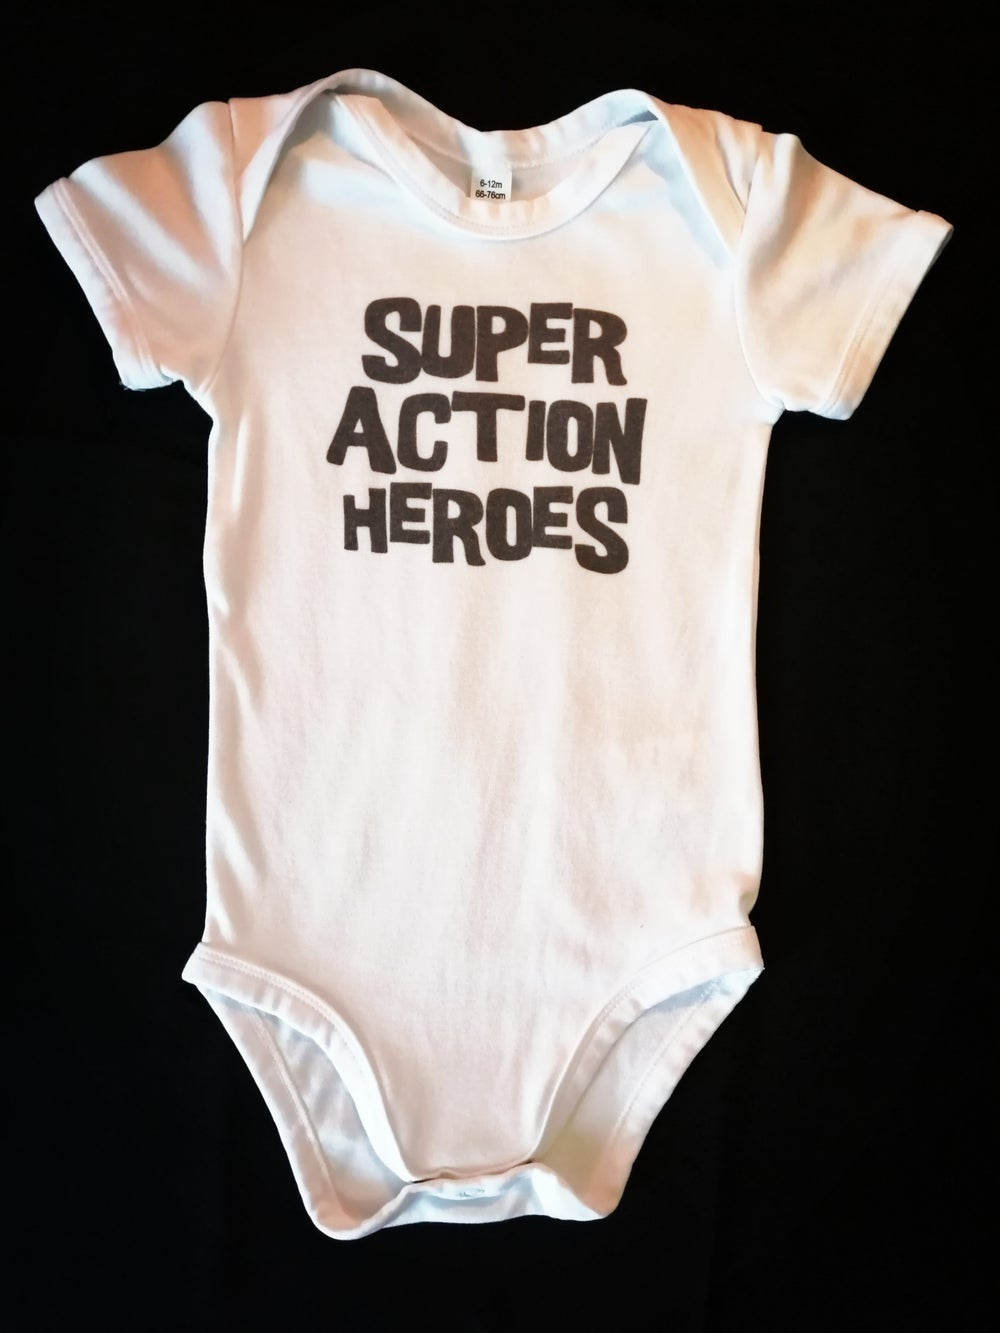 SUPER ACTION HEROES Hero Baby Bodysuit (pre-order)